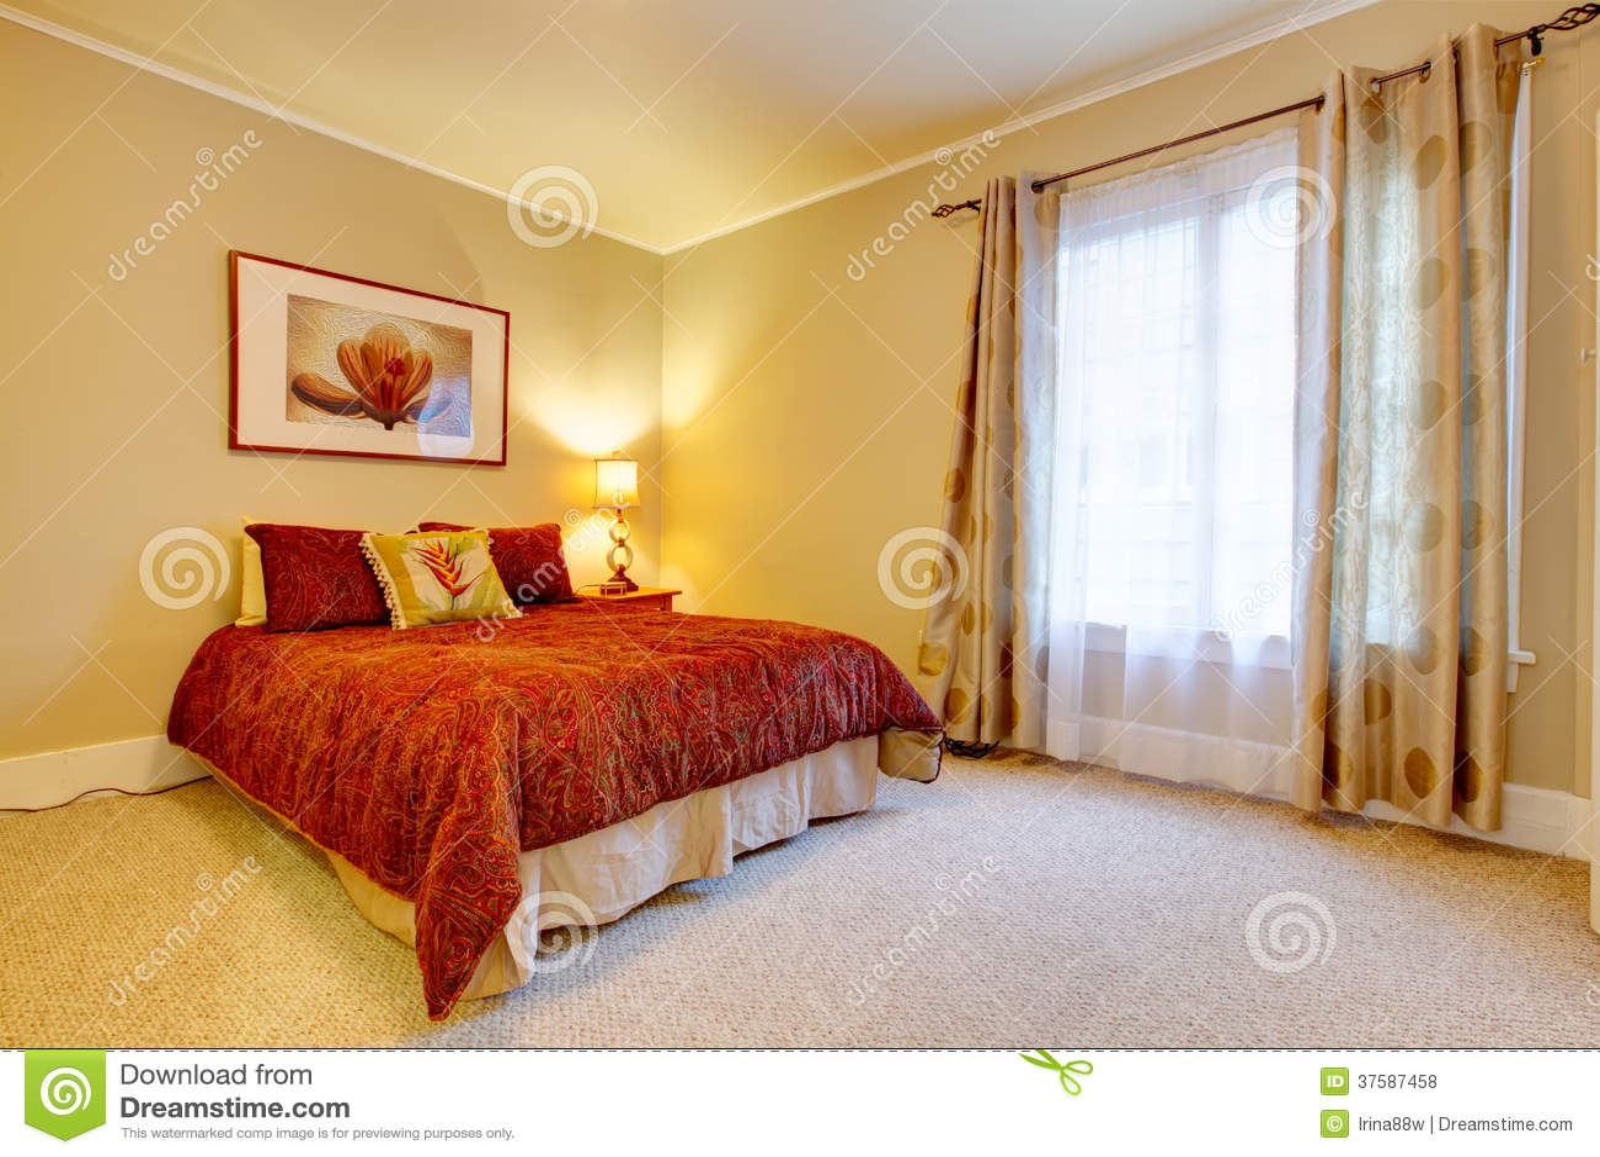 Charmante slaapkamer met mooi rood beddegoed royalty vrije stock ...